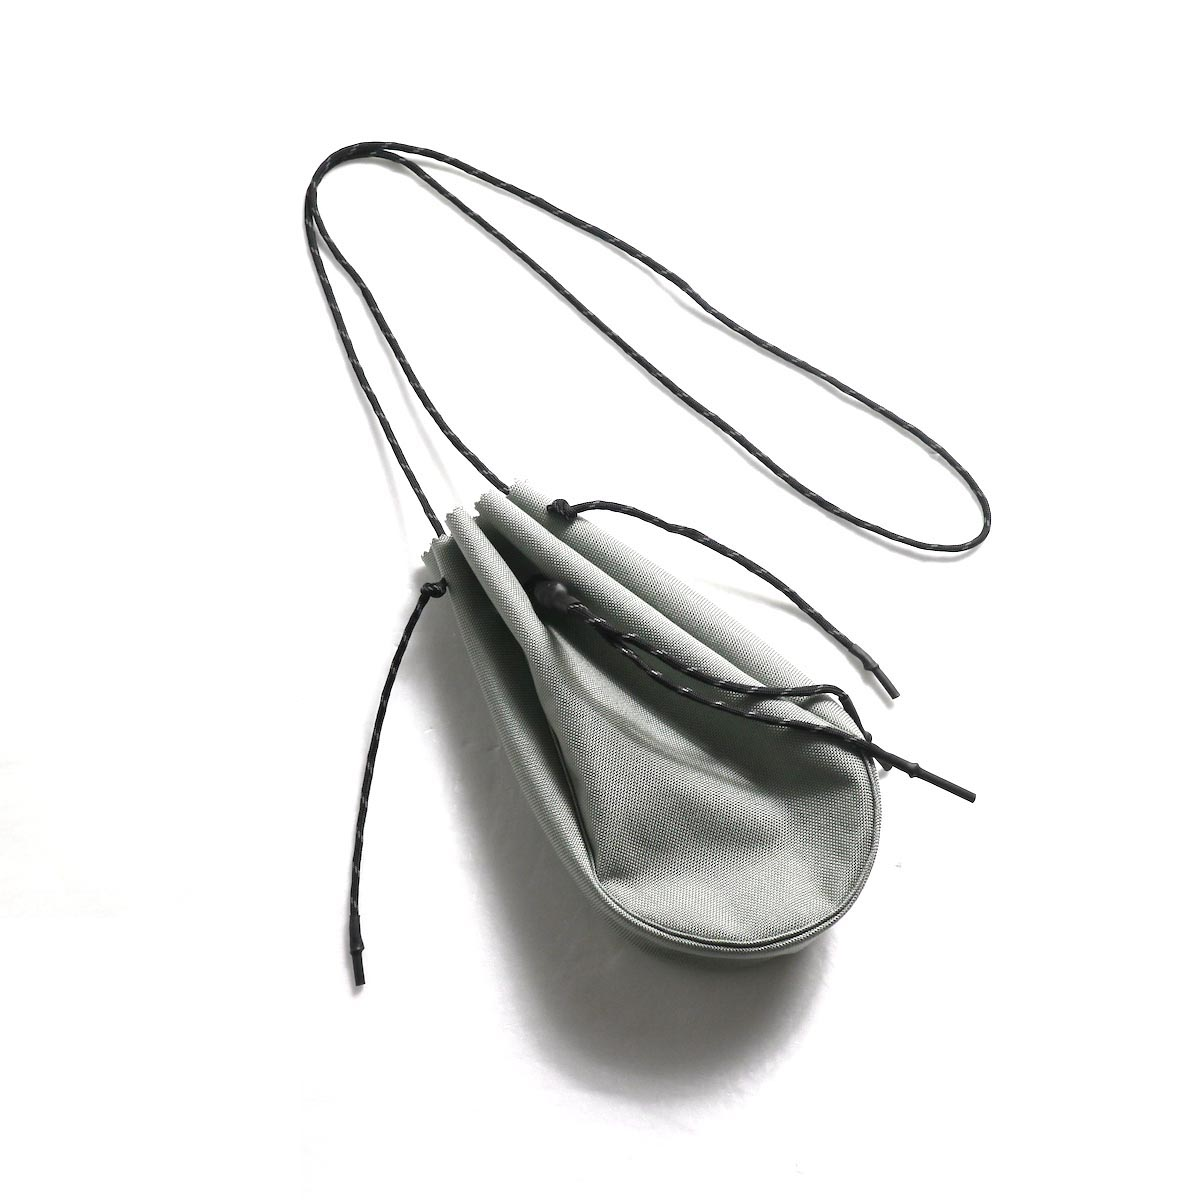 吉岡衣料店 / drawstring bag -S-. (Gray)